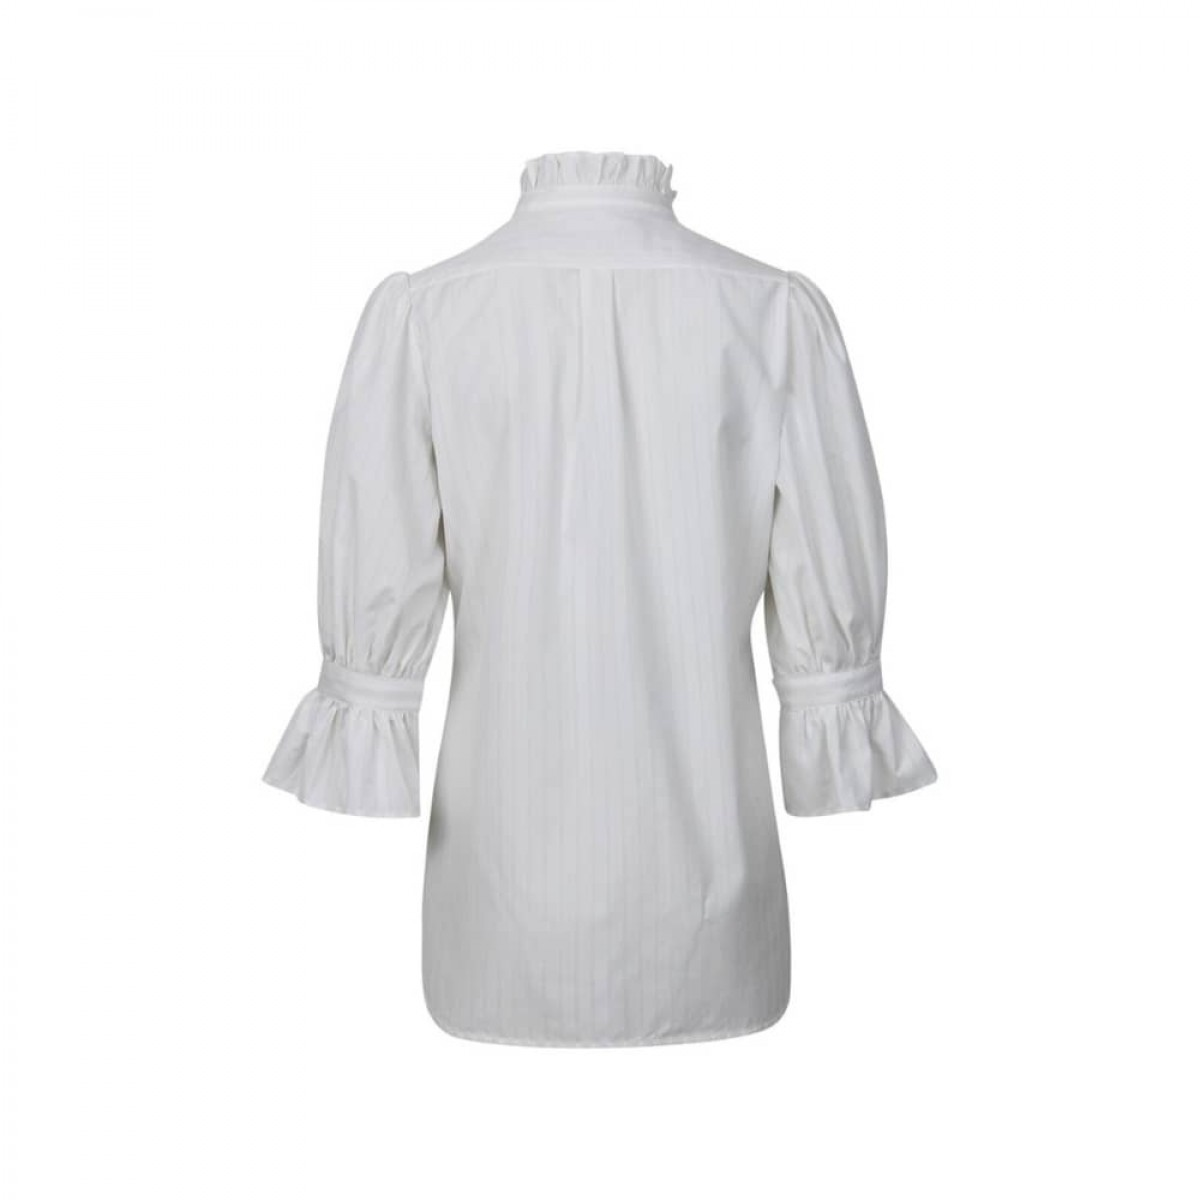 joanna skjorte - vanilla stripe - bag